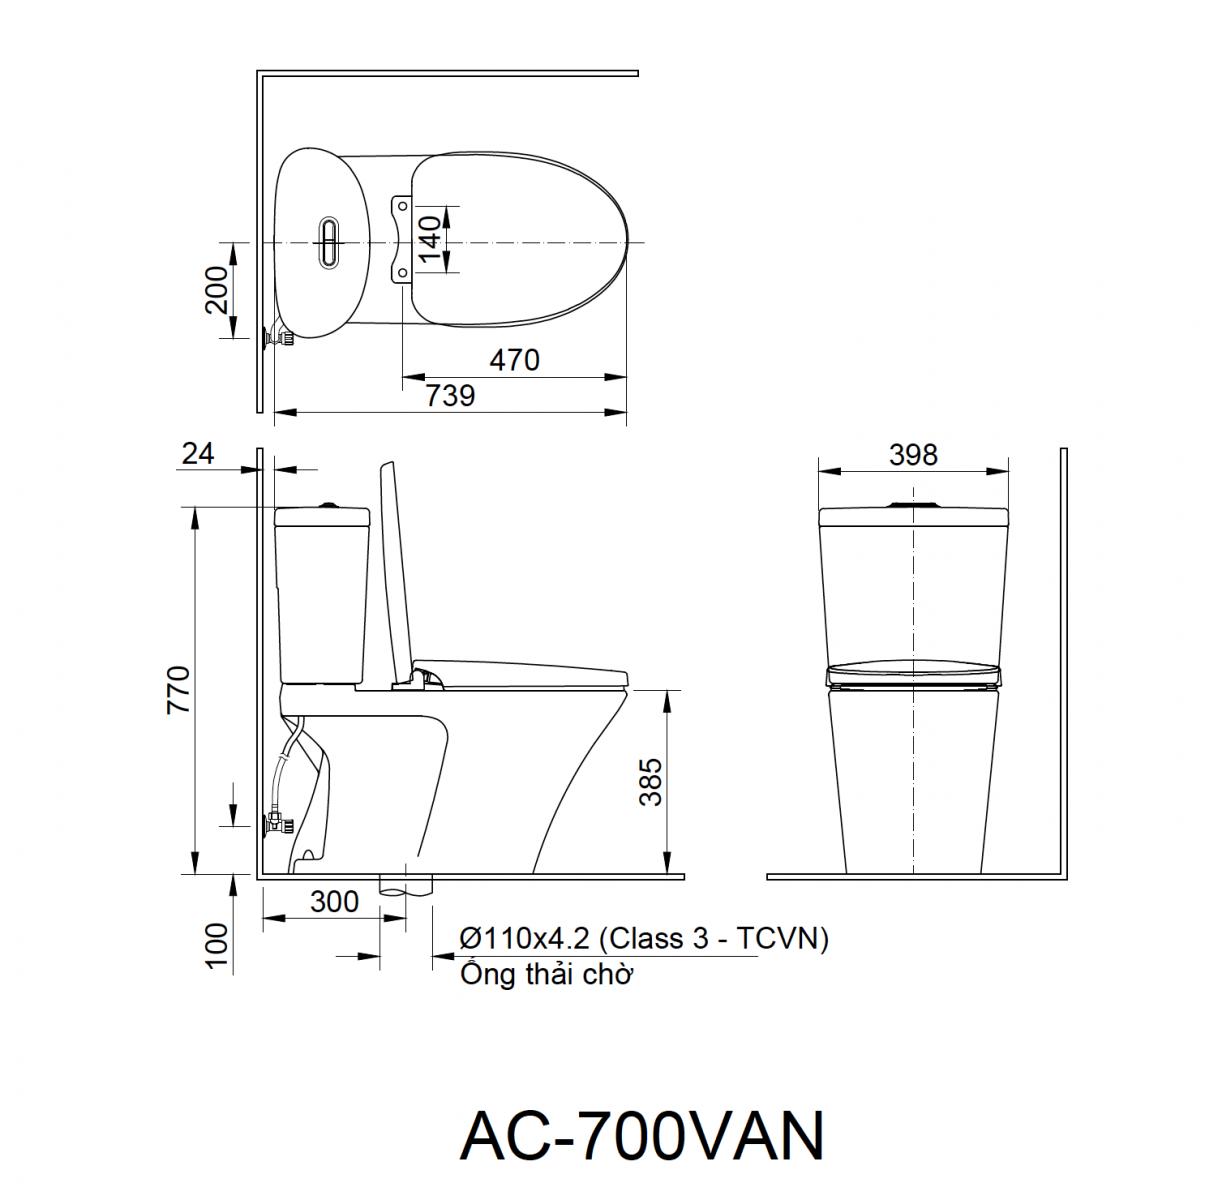 Bồn cầu 2 khối Inax AC-700VAN